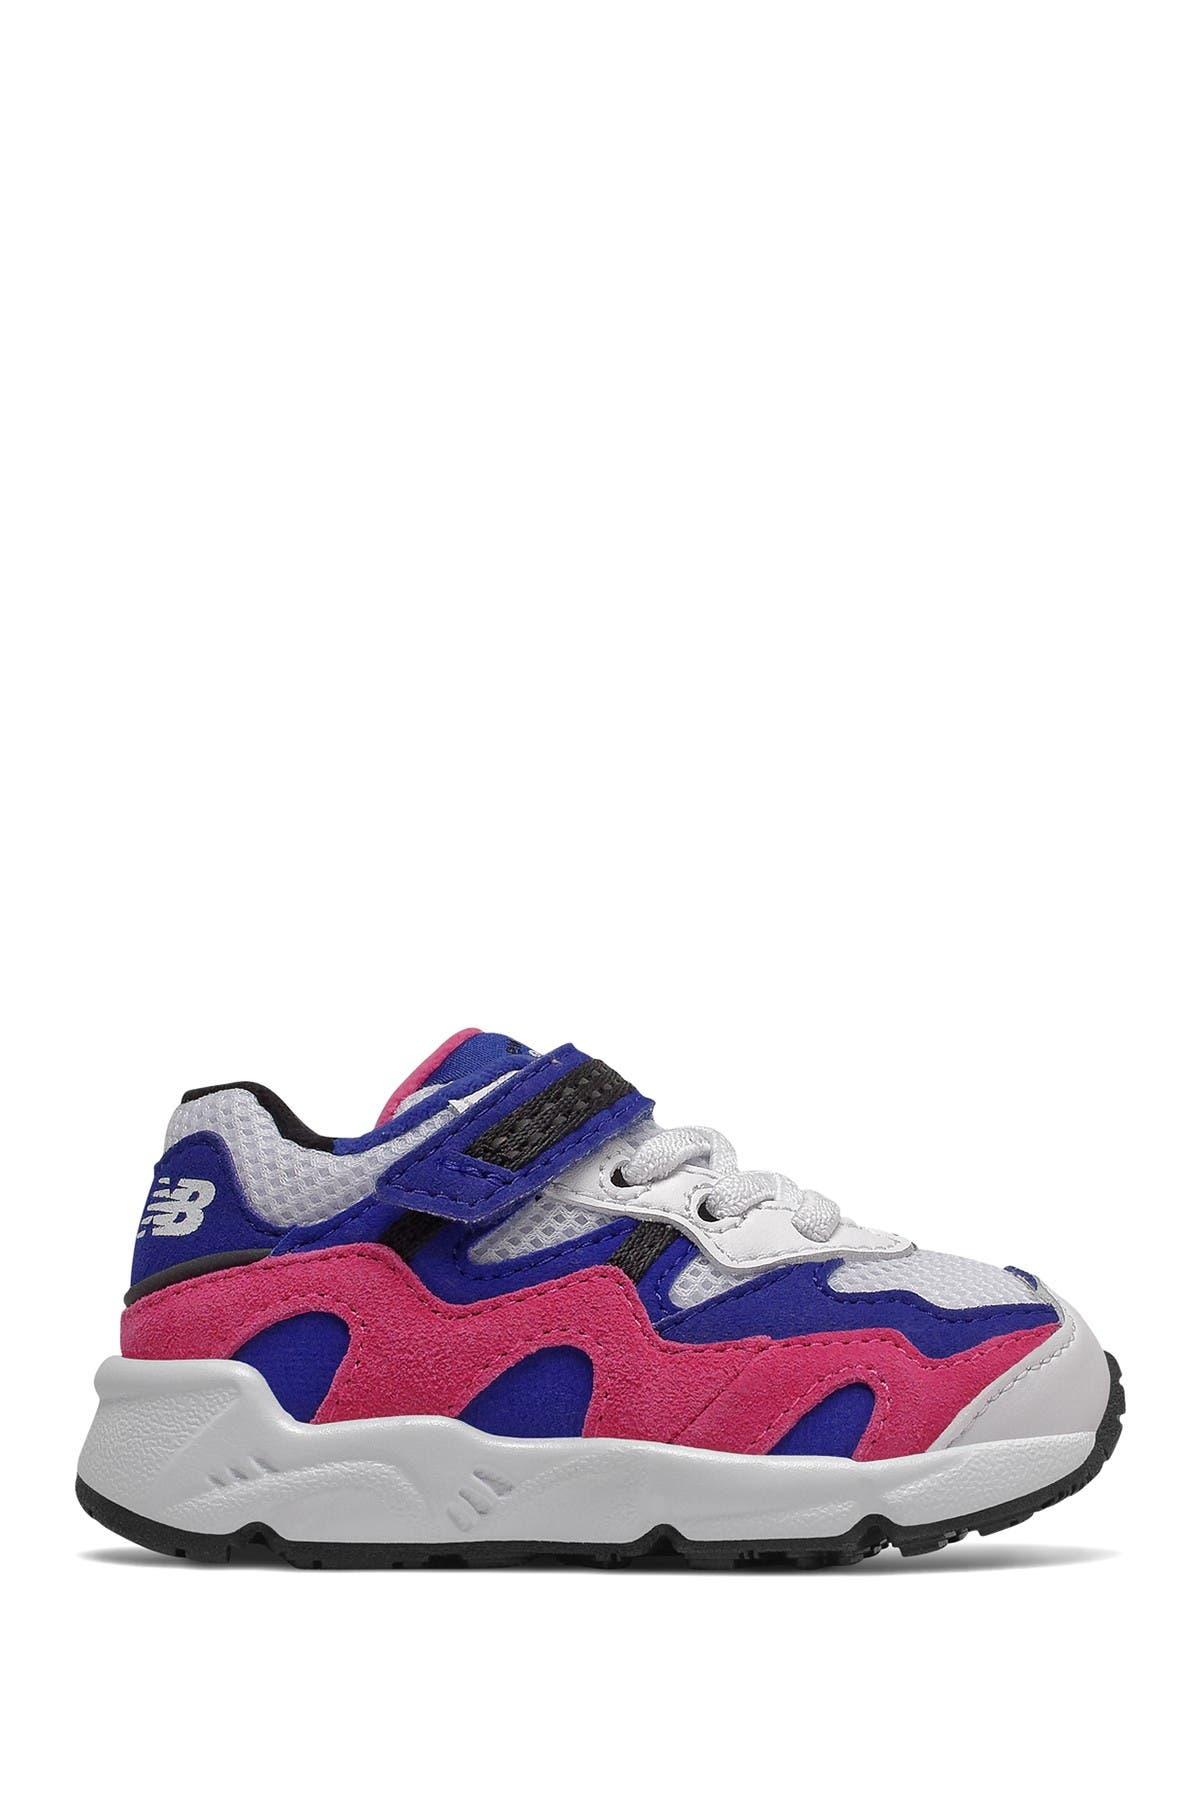 Image of New Balance 850 Classic Running Shoe